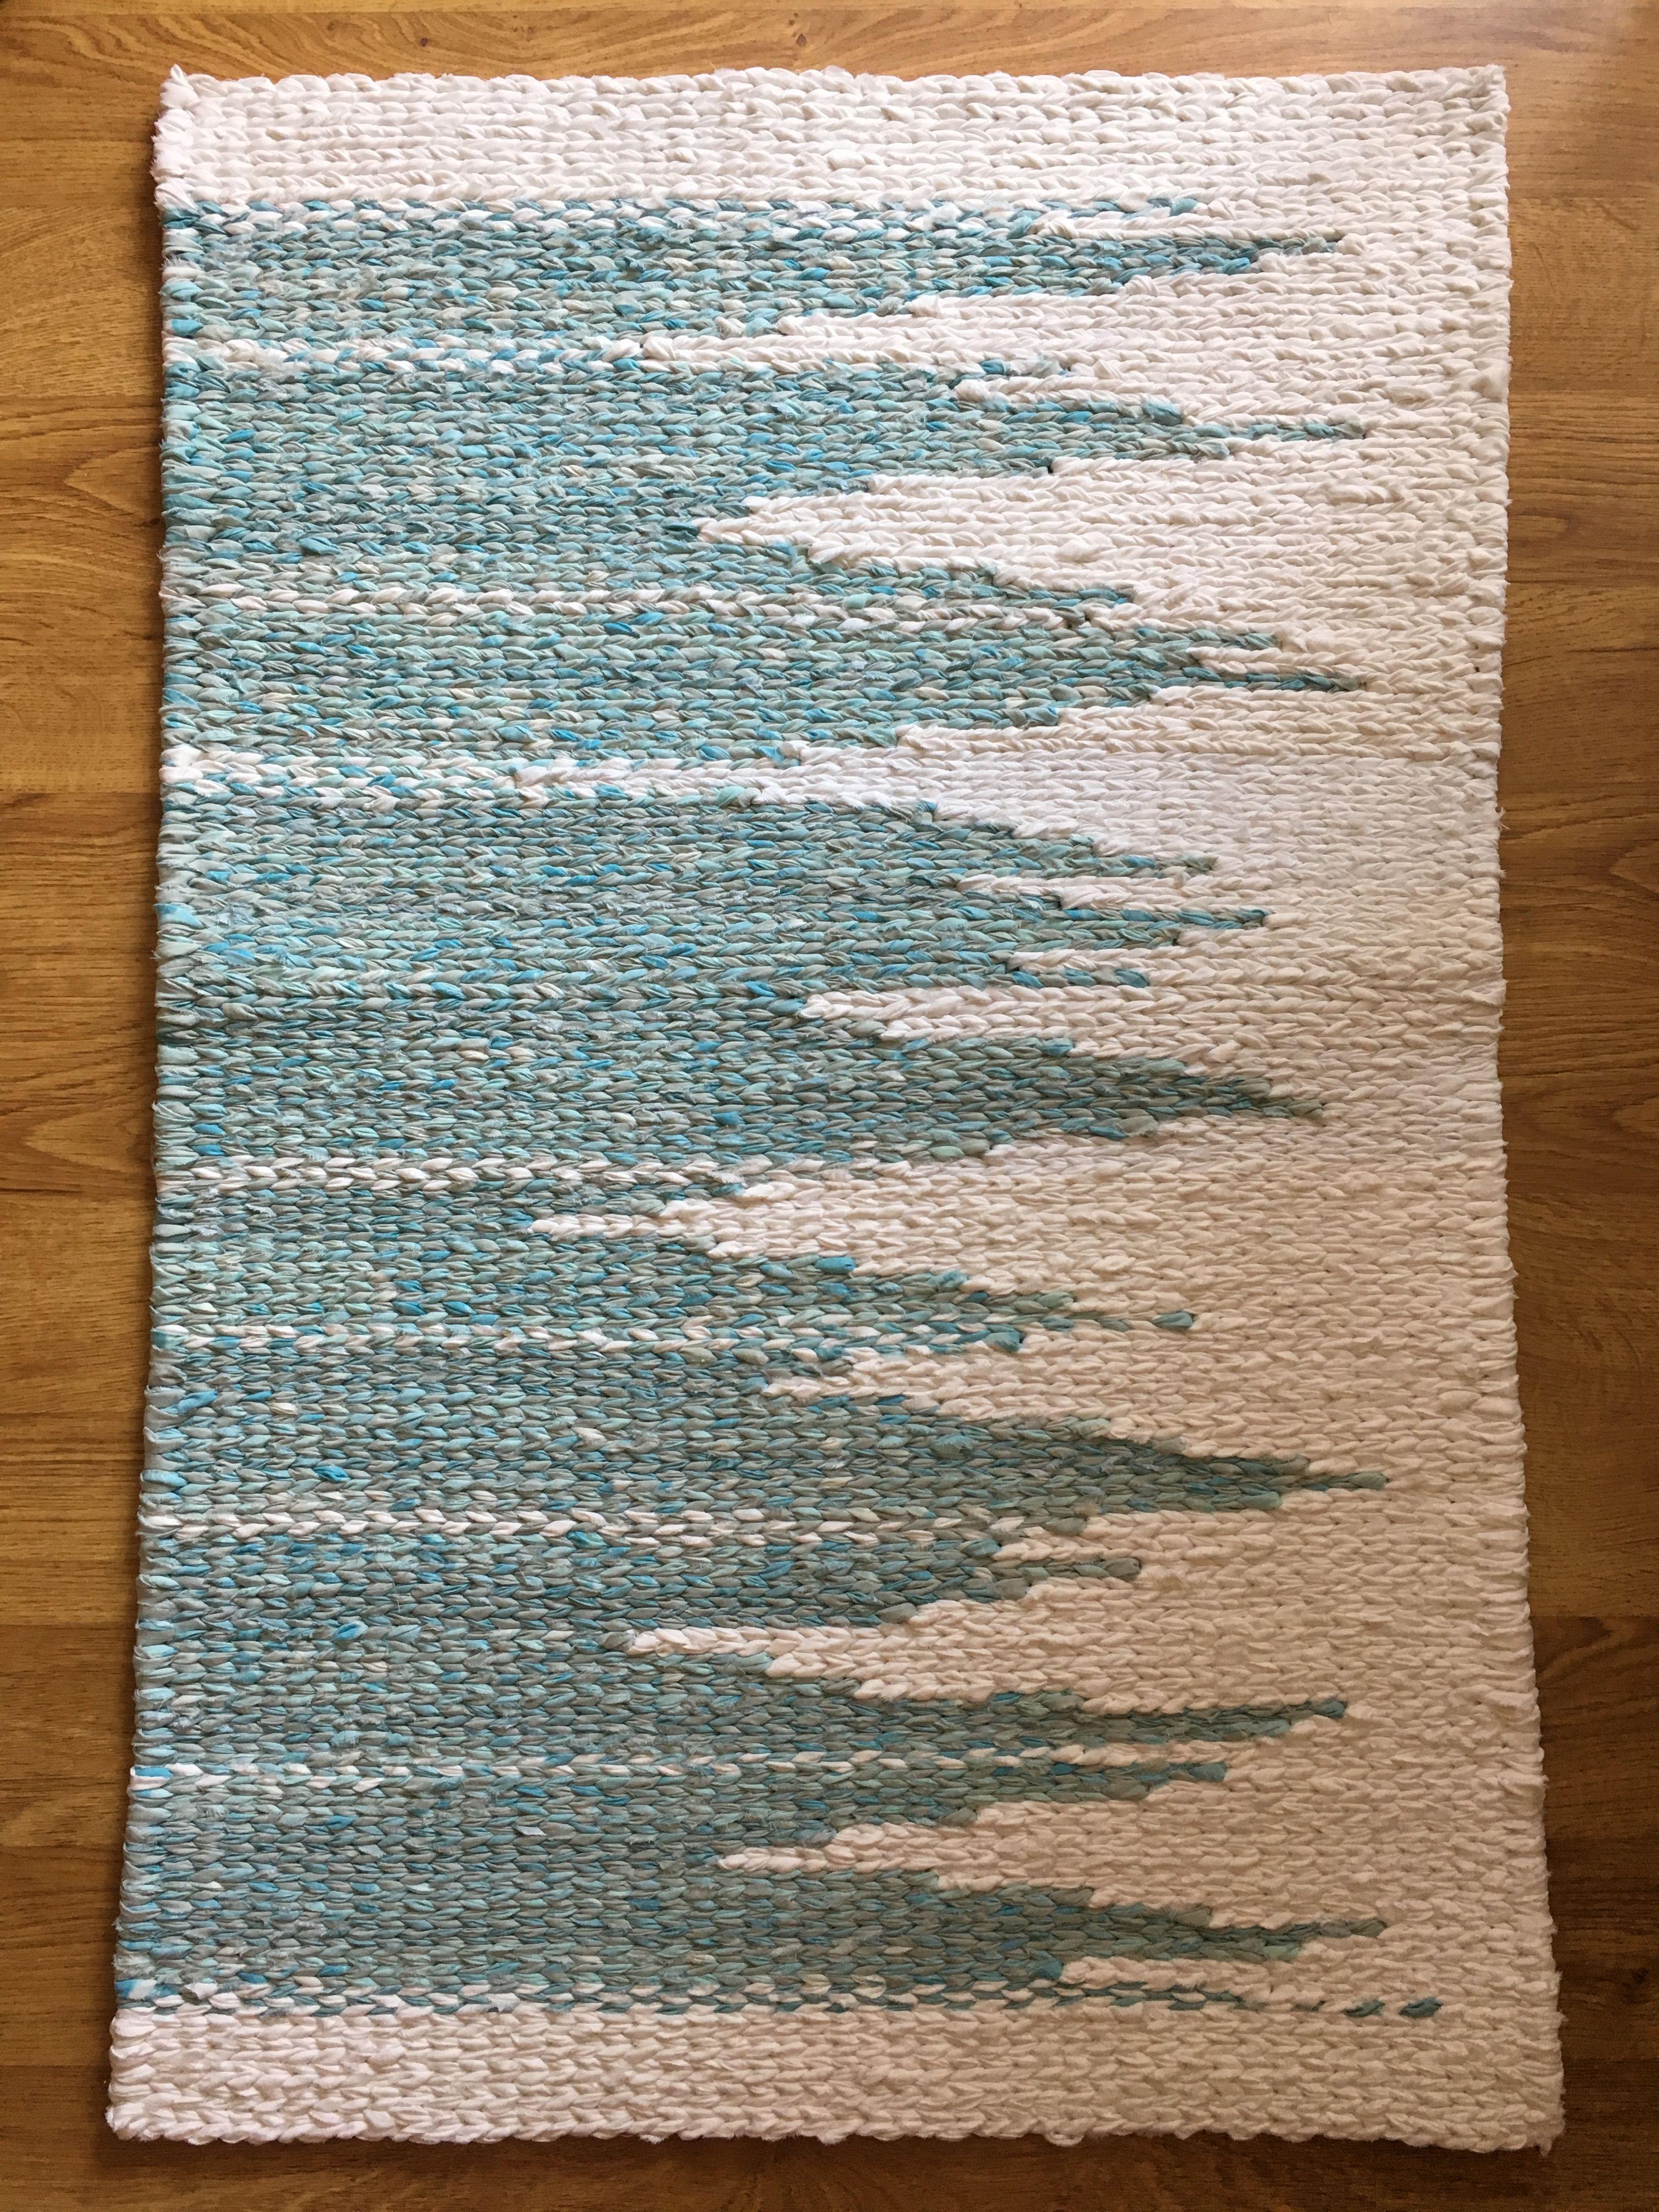 Twined Rag Rug 2 X3 Made By Sunniside Studio Woven Rug Diy Rug Weaving Loom Rag Rug